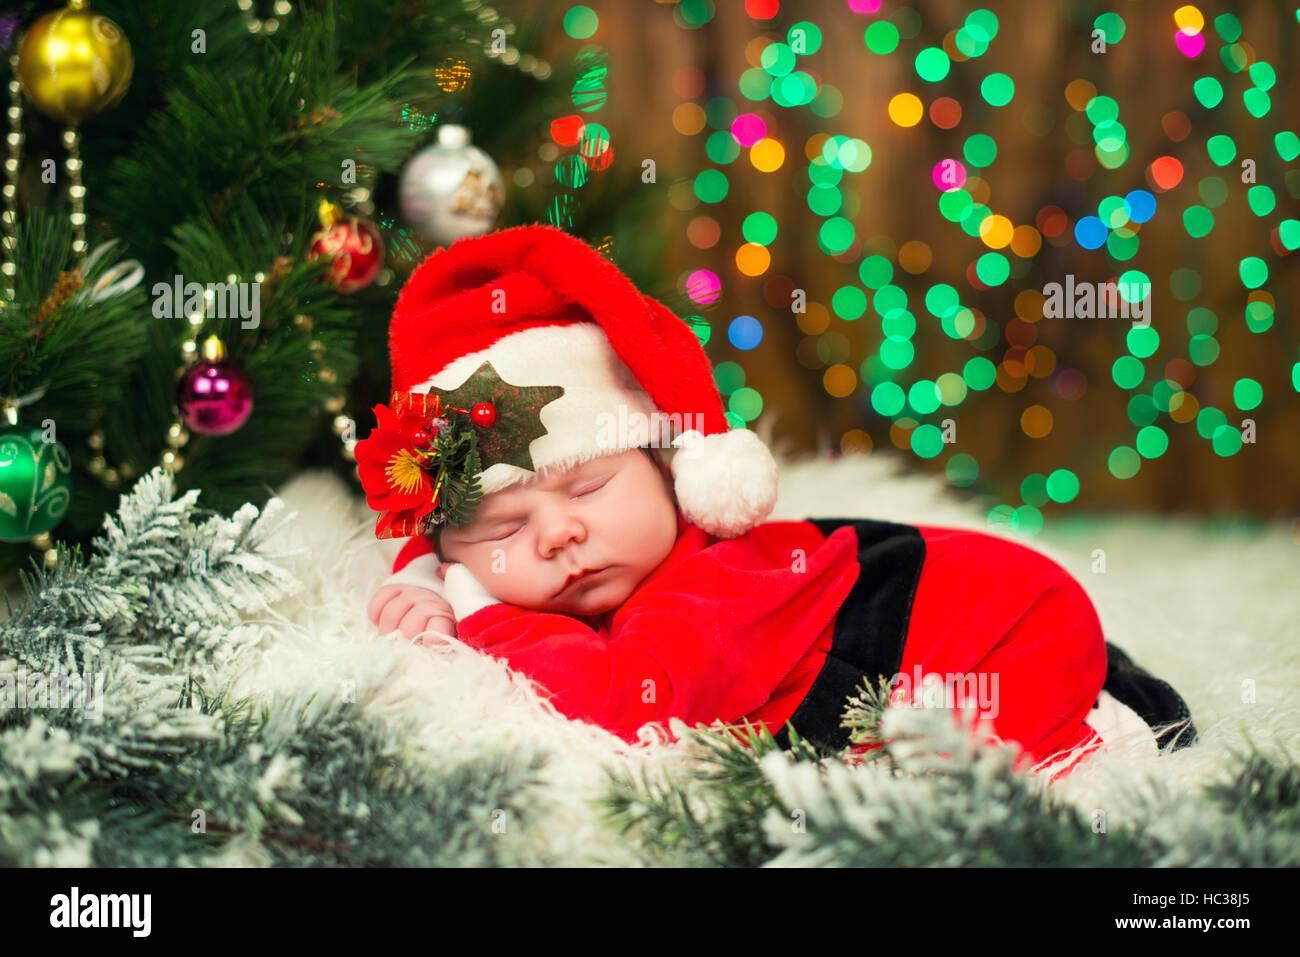 Portrait Of Newborn Baby In Santa Clothes Lying Under